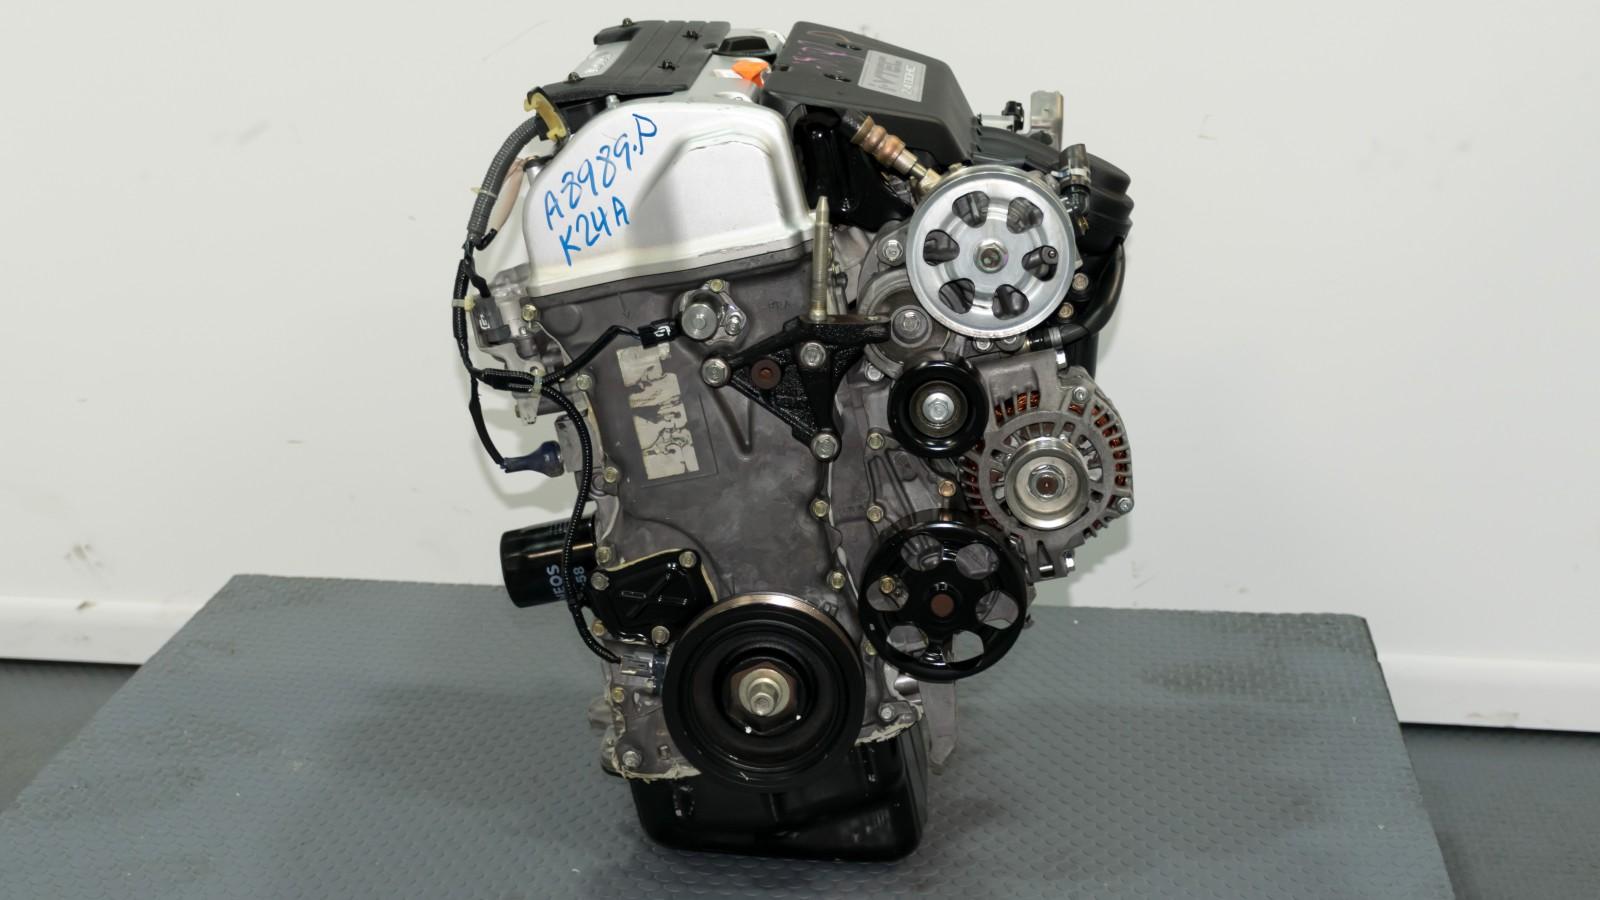 2002 2003 2004 2005 2006 honda crv element k24a engine 2 4l dohc vtec